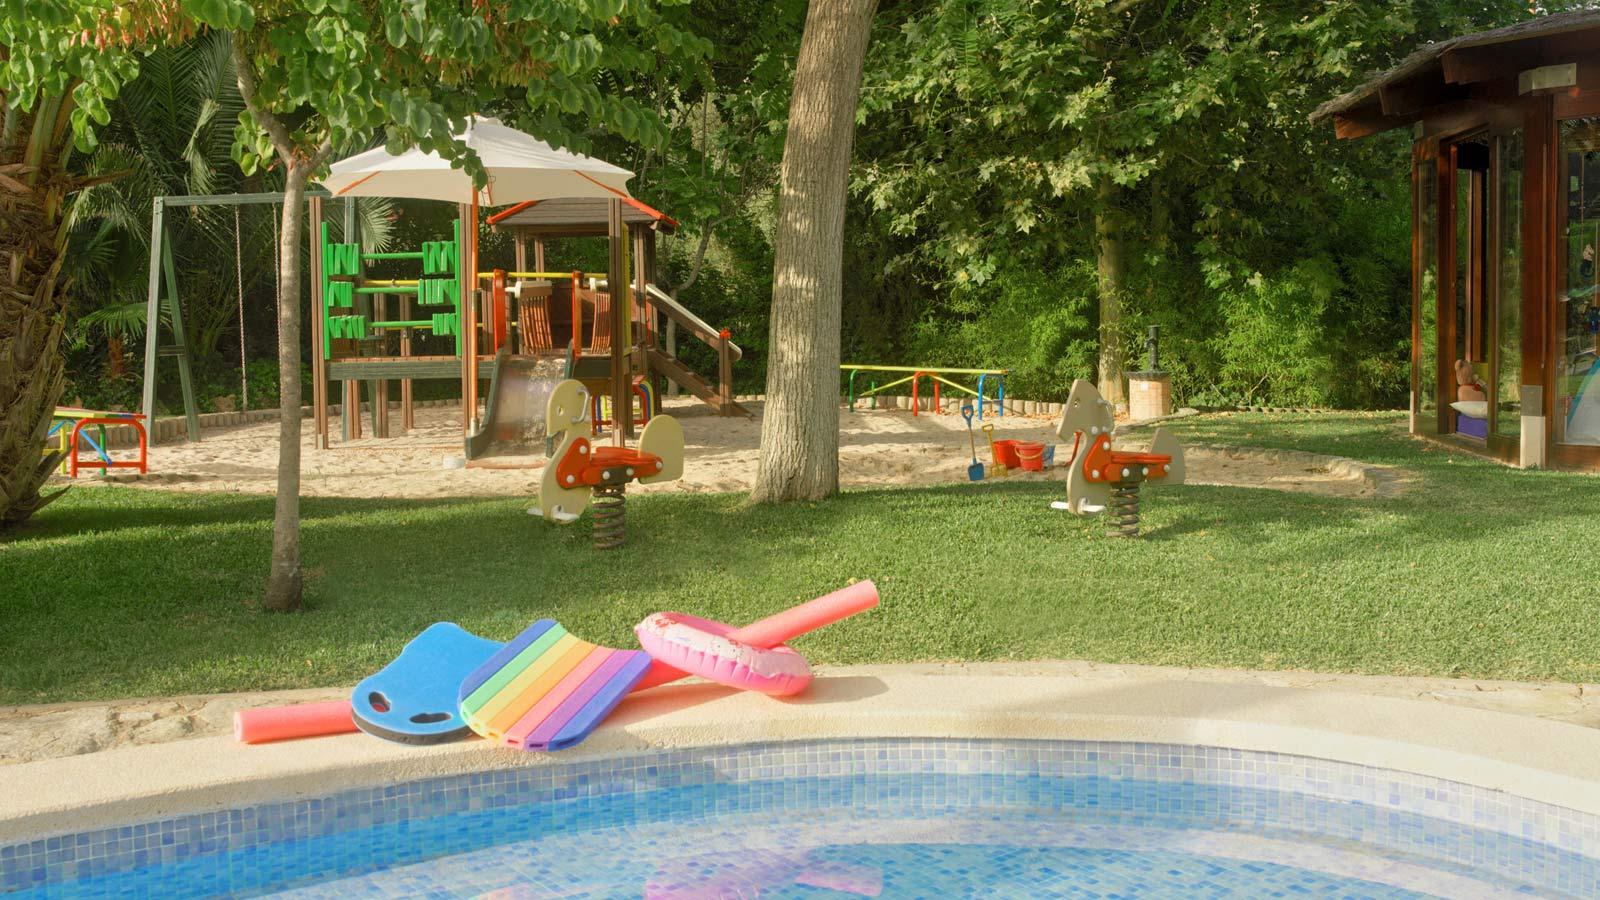 Kids' Club playground and pool at Sheraton Mallorca